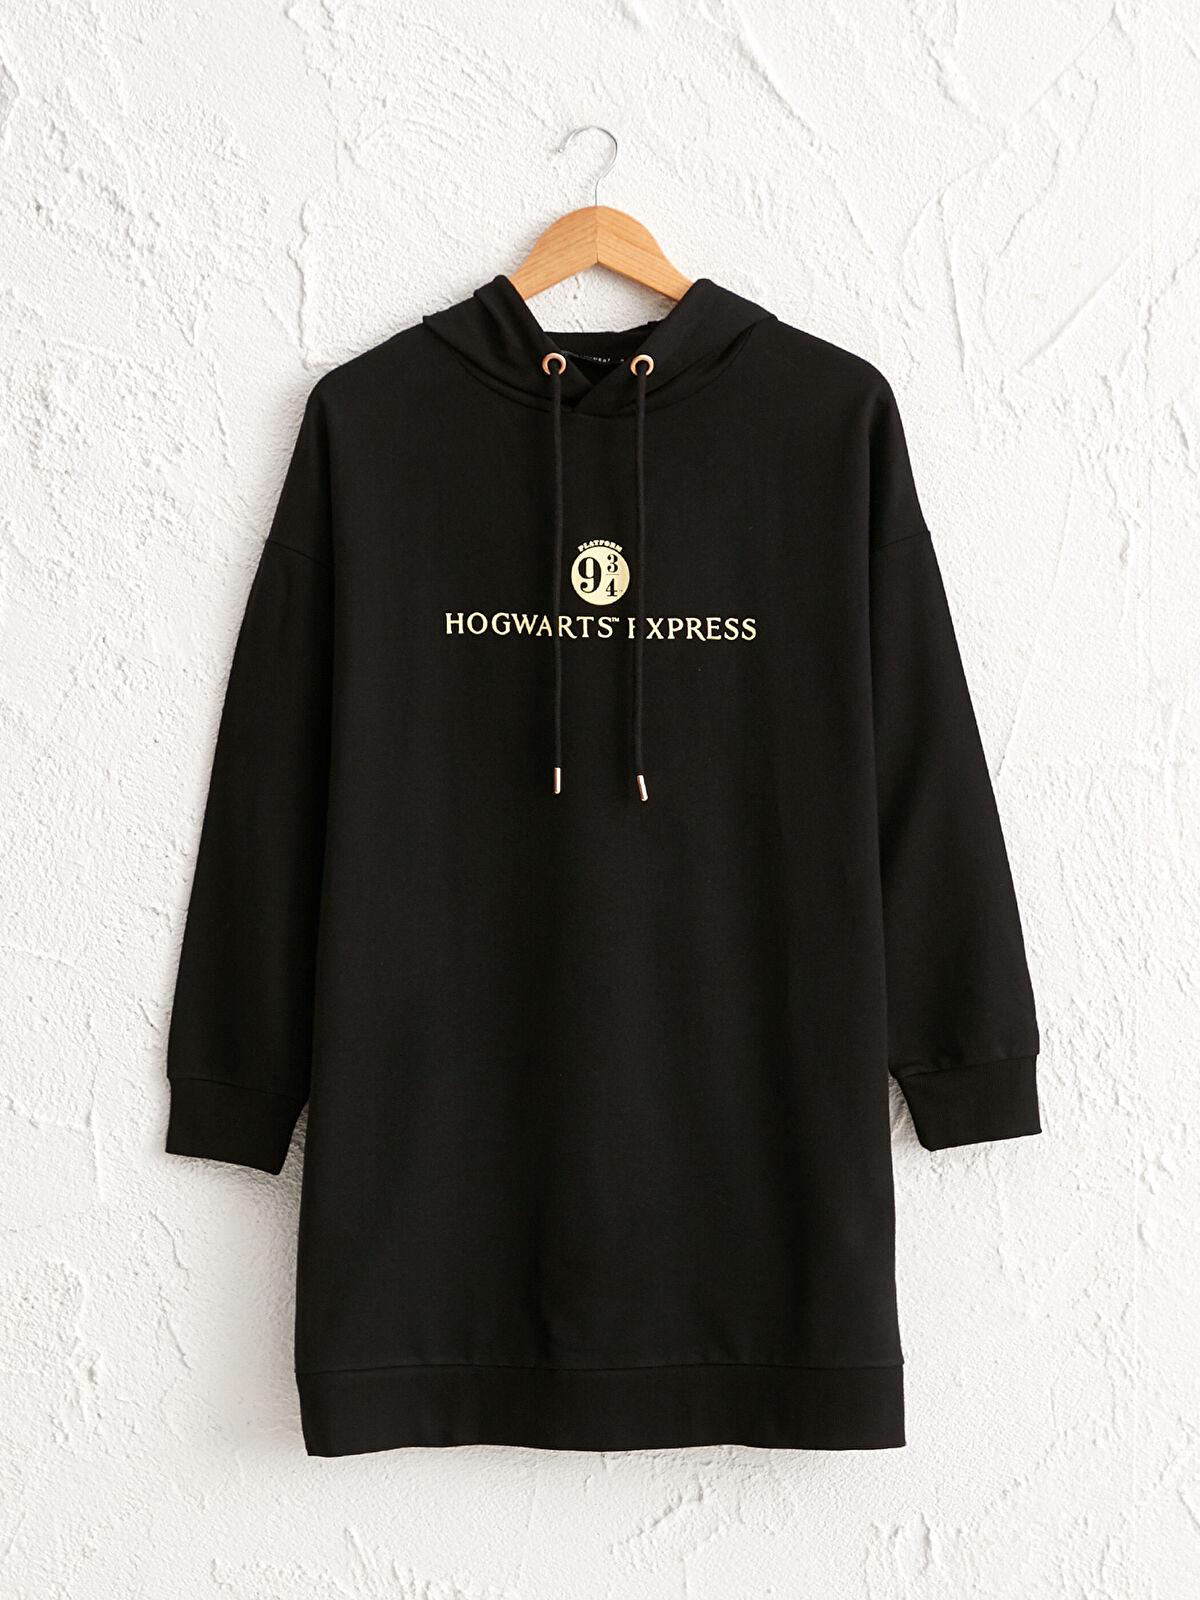 Hogwarts Baskılı Oversize Sweatshirt - LC WAIKIKI